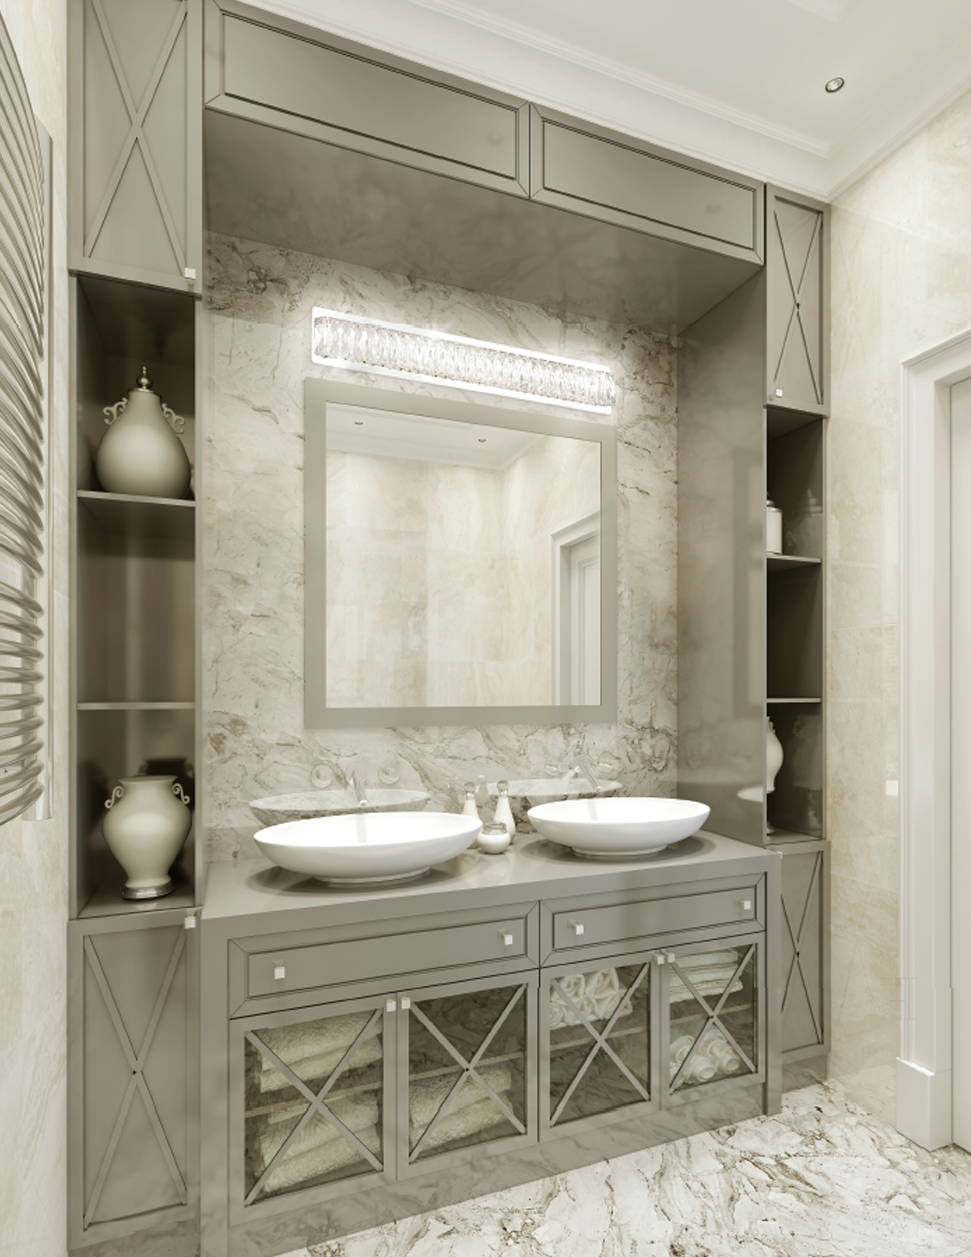 Kuzco Solaris Lighting Bathroom Sconce